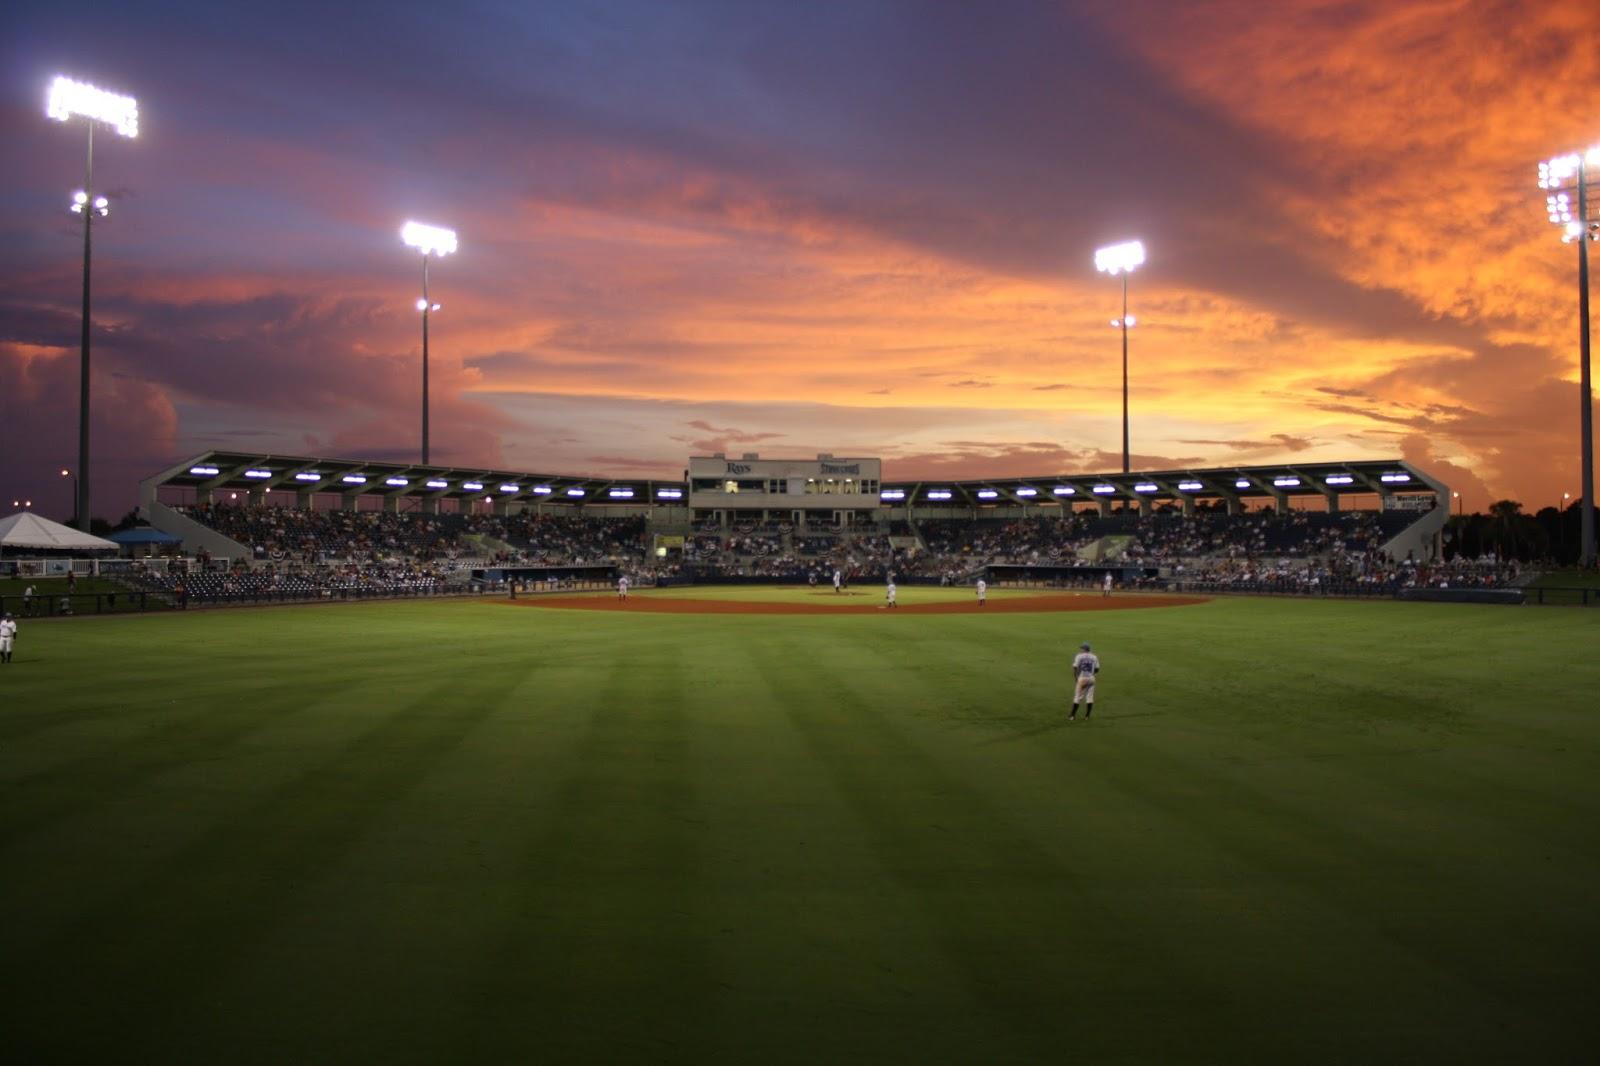 Softball field photography